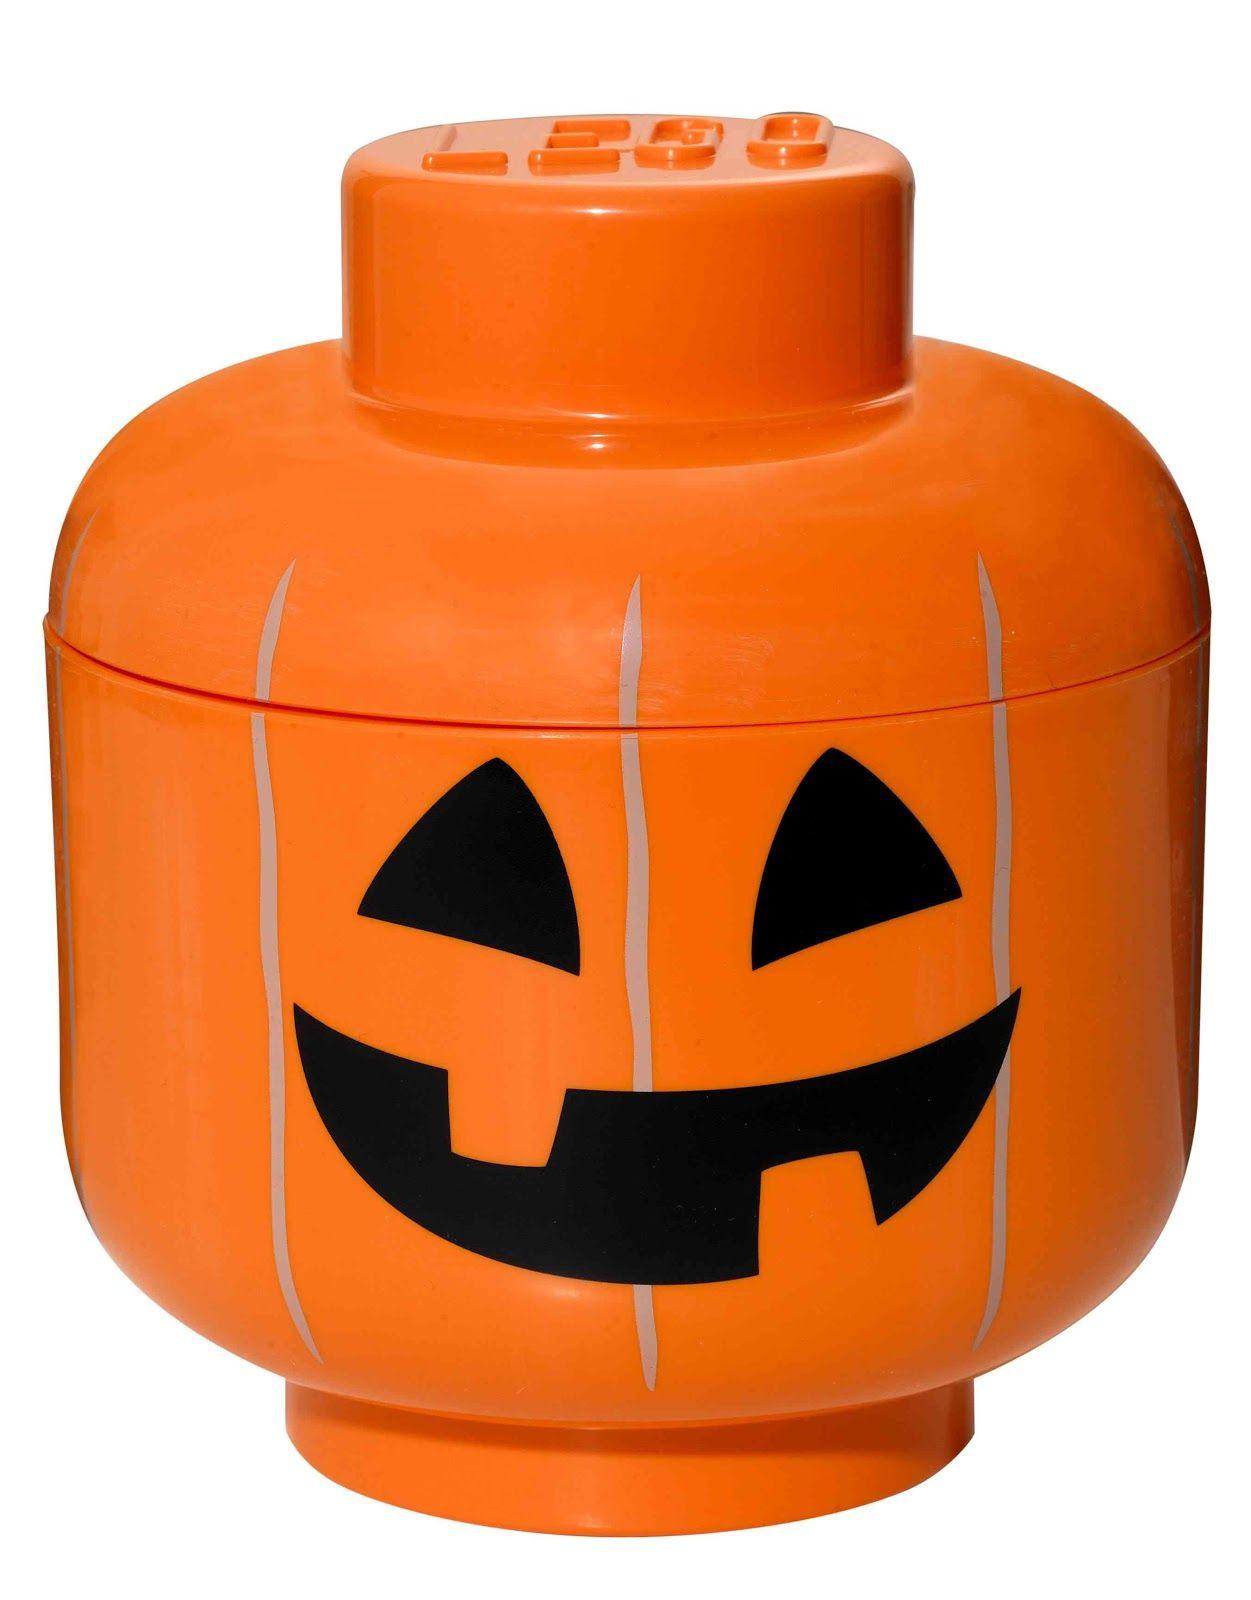 lego storage bricks & halloween ones | lego | pinterest | lego, lego